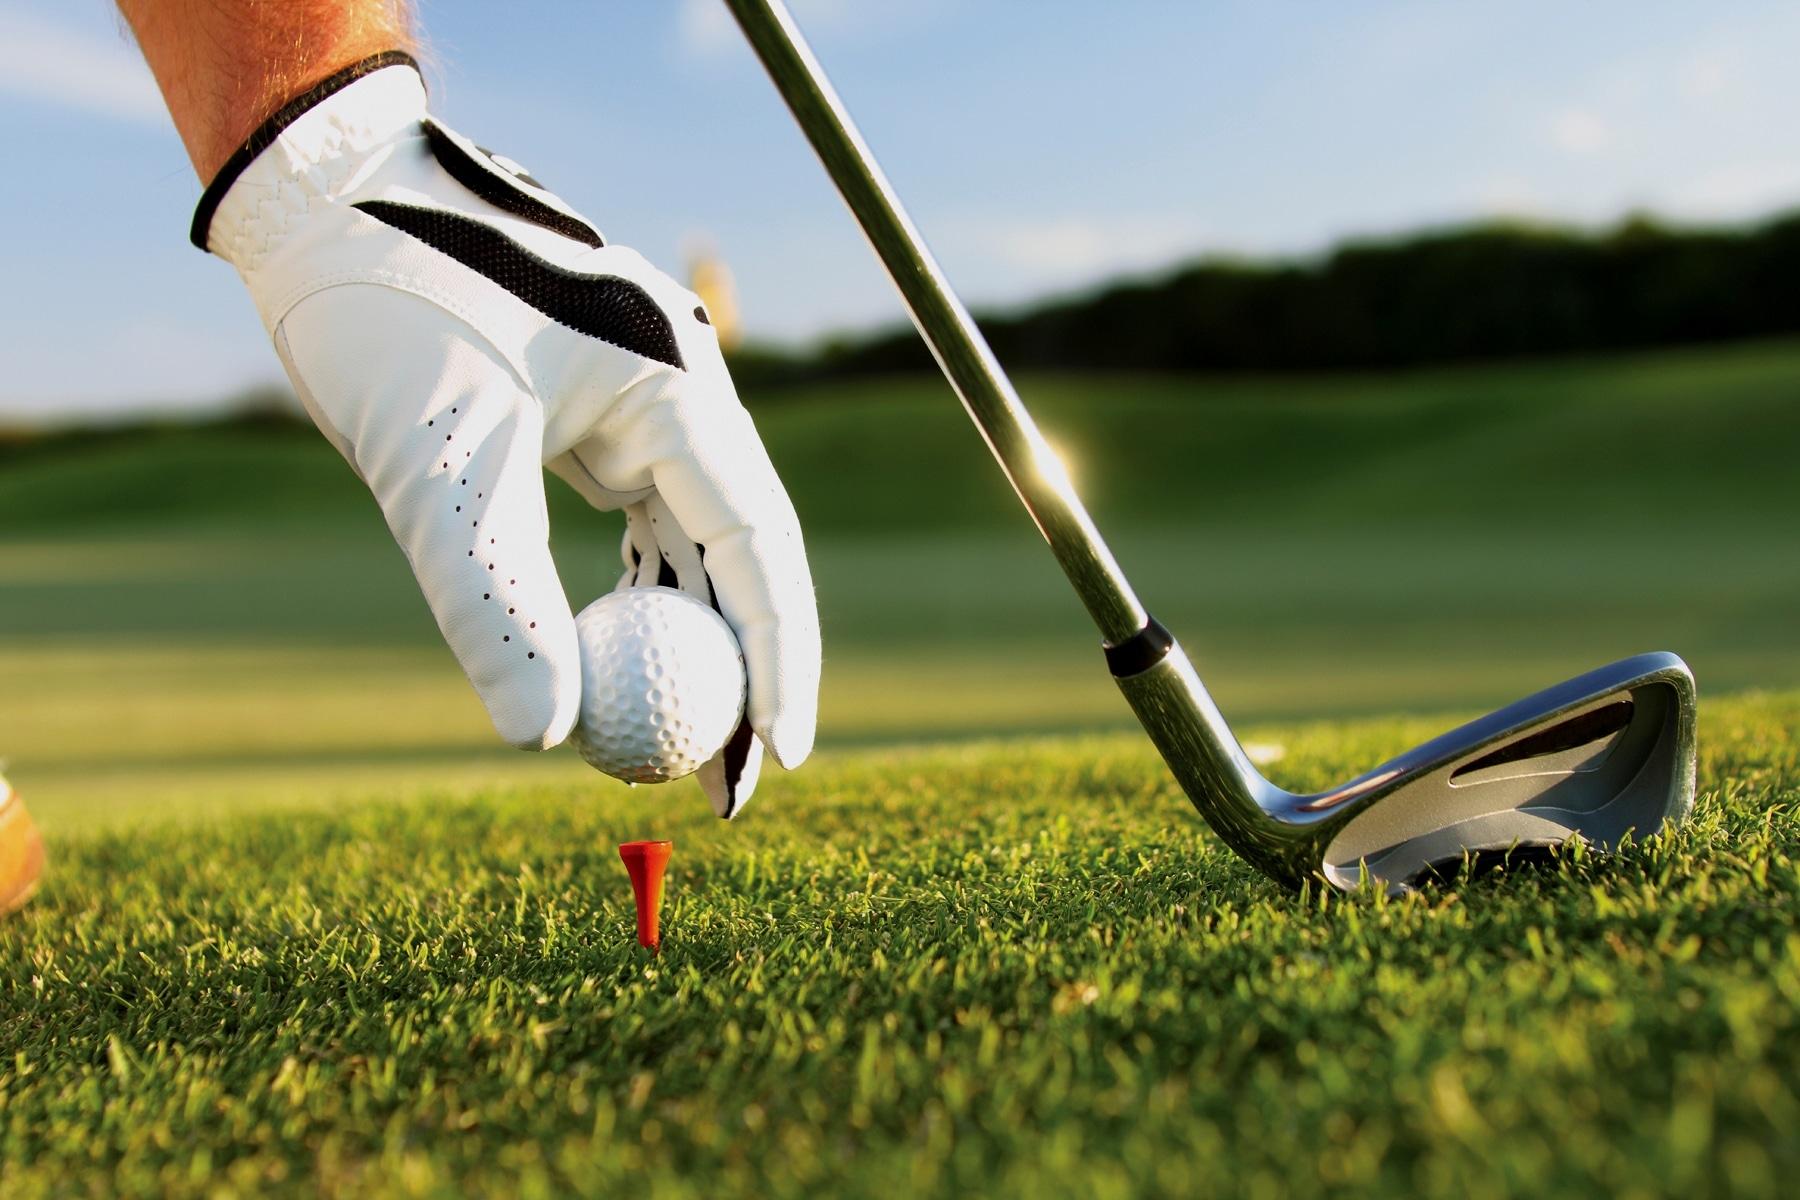 Sejarah Bola Golf